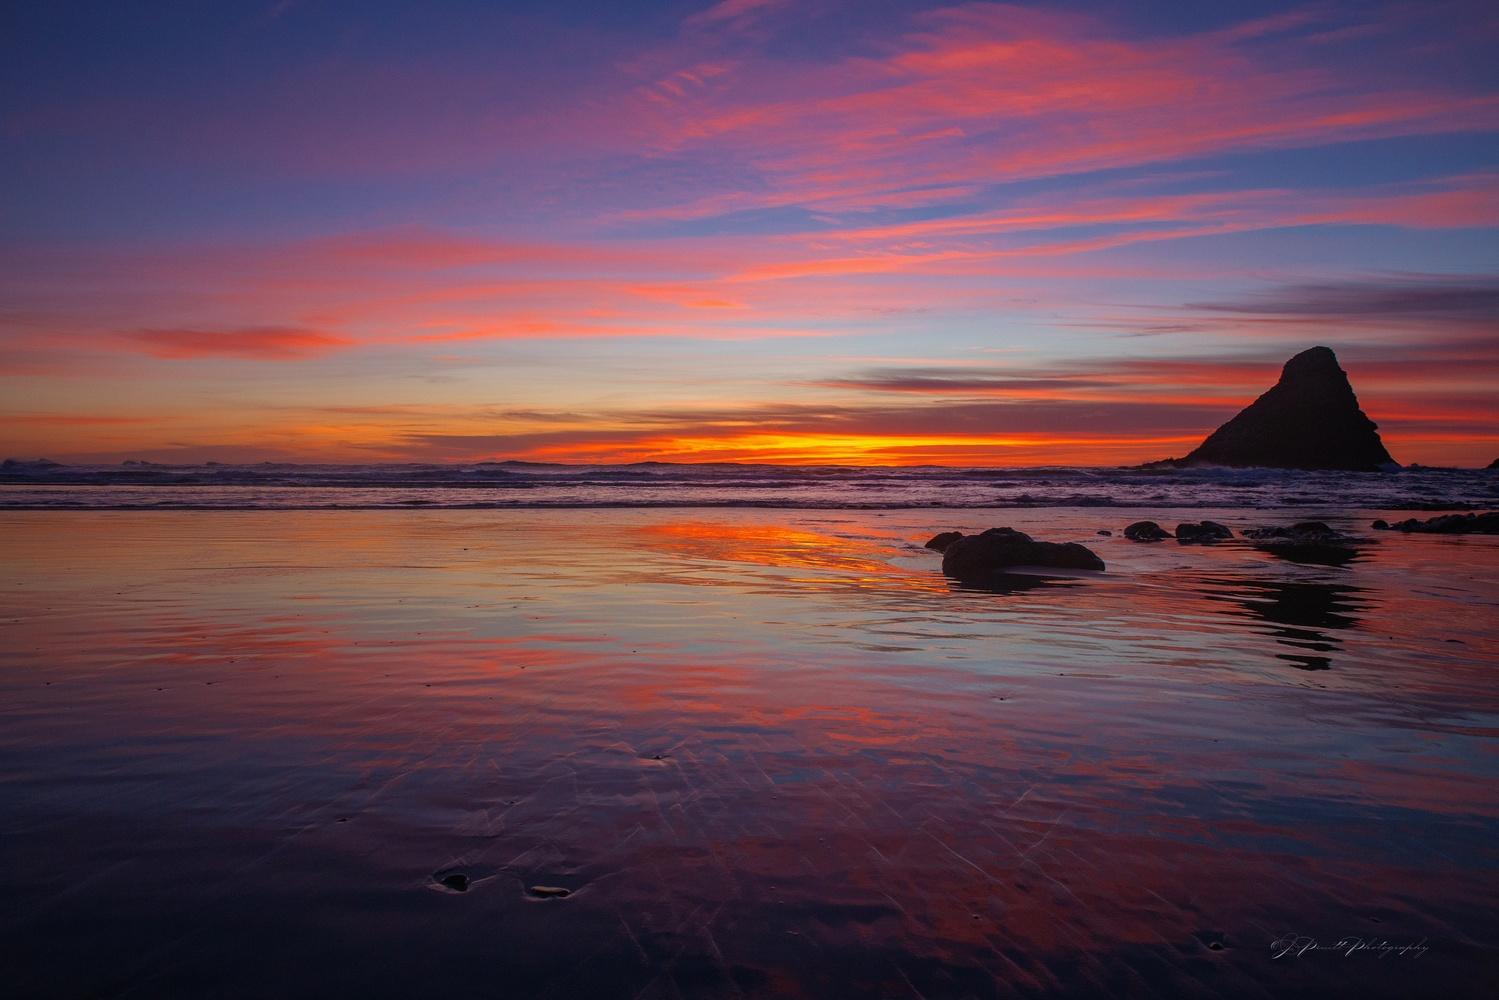 Hecata Sunset by Joel Thompson